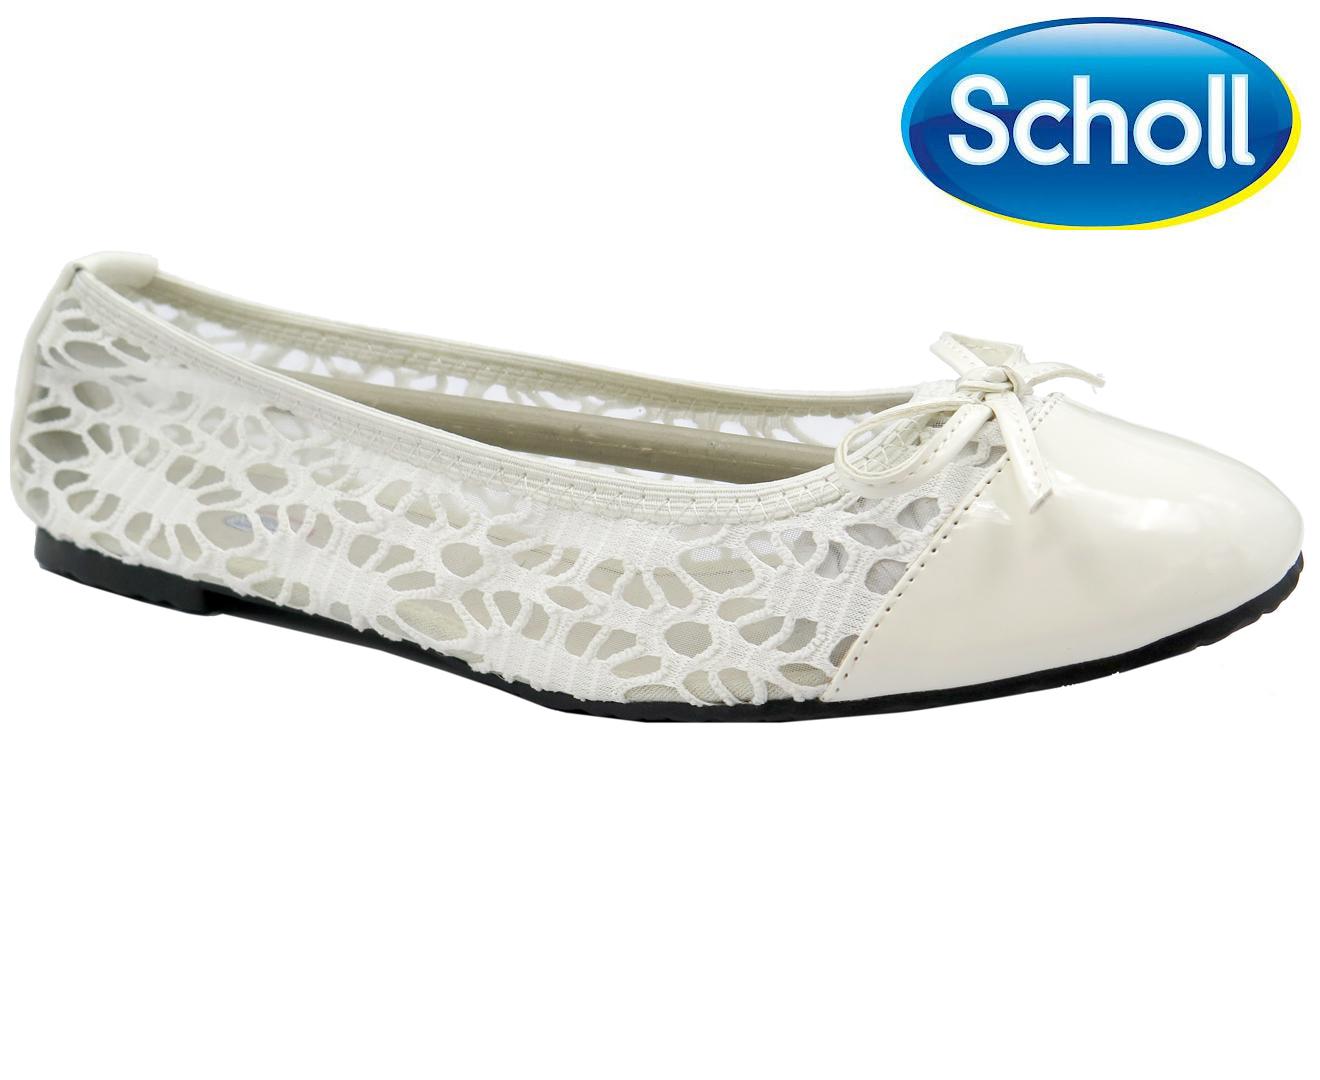 Scholl Ballerina White Lace Flat Women's Pocket tQhdBsrCx